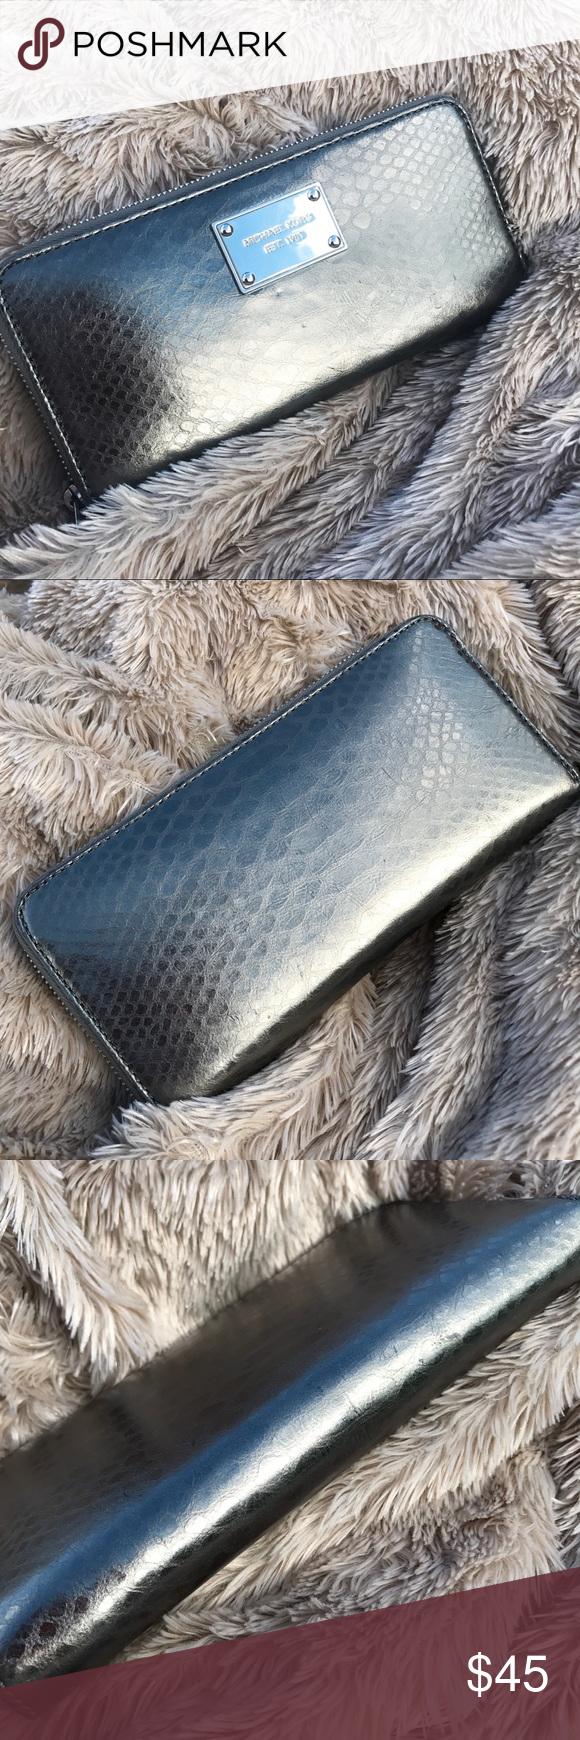 594b41c2f0e303 ... Saffiano Leather Continental Wallet. michaelkors all Michael Kors Jet  Set gunmetal zip-around wallet .